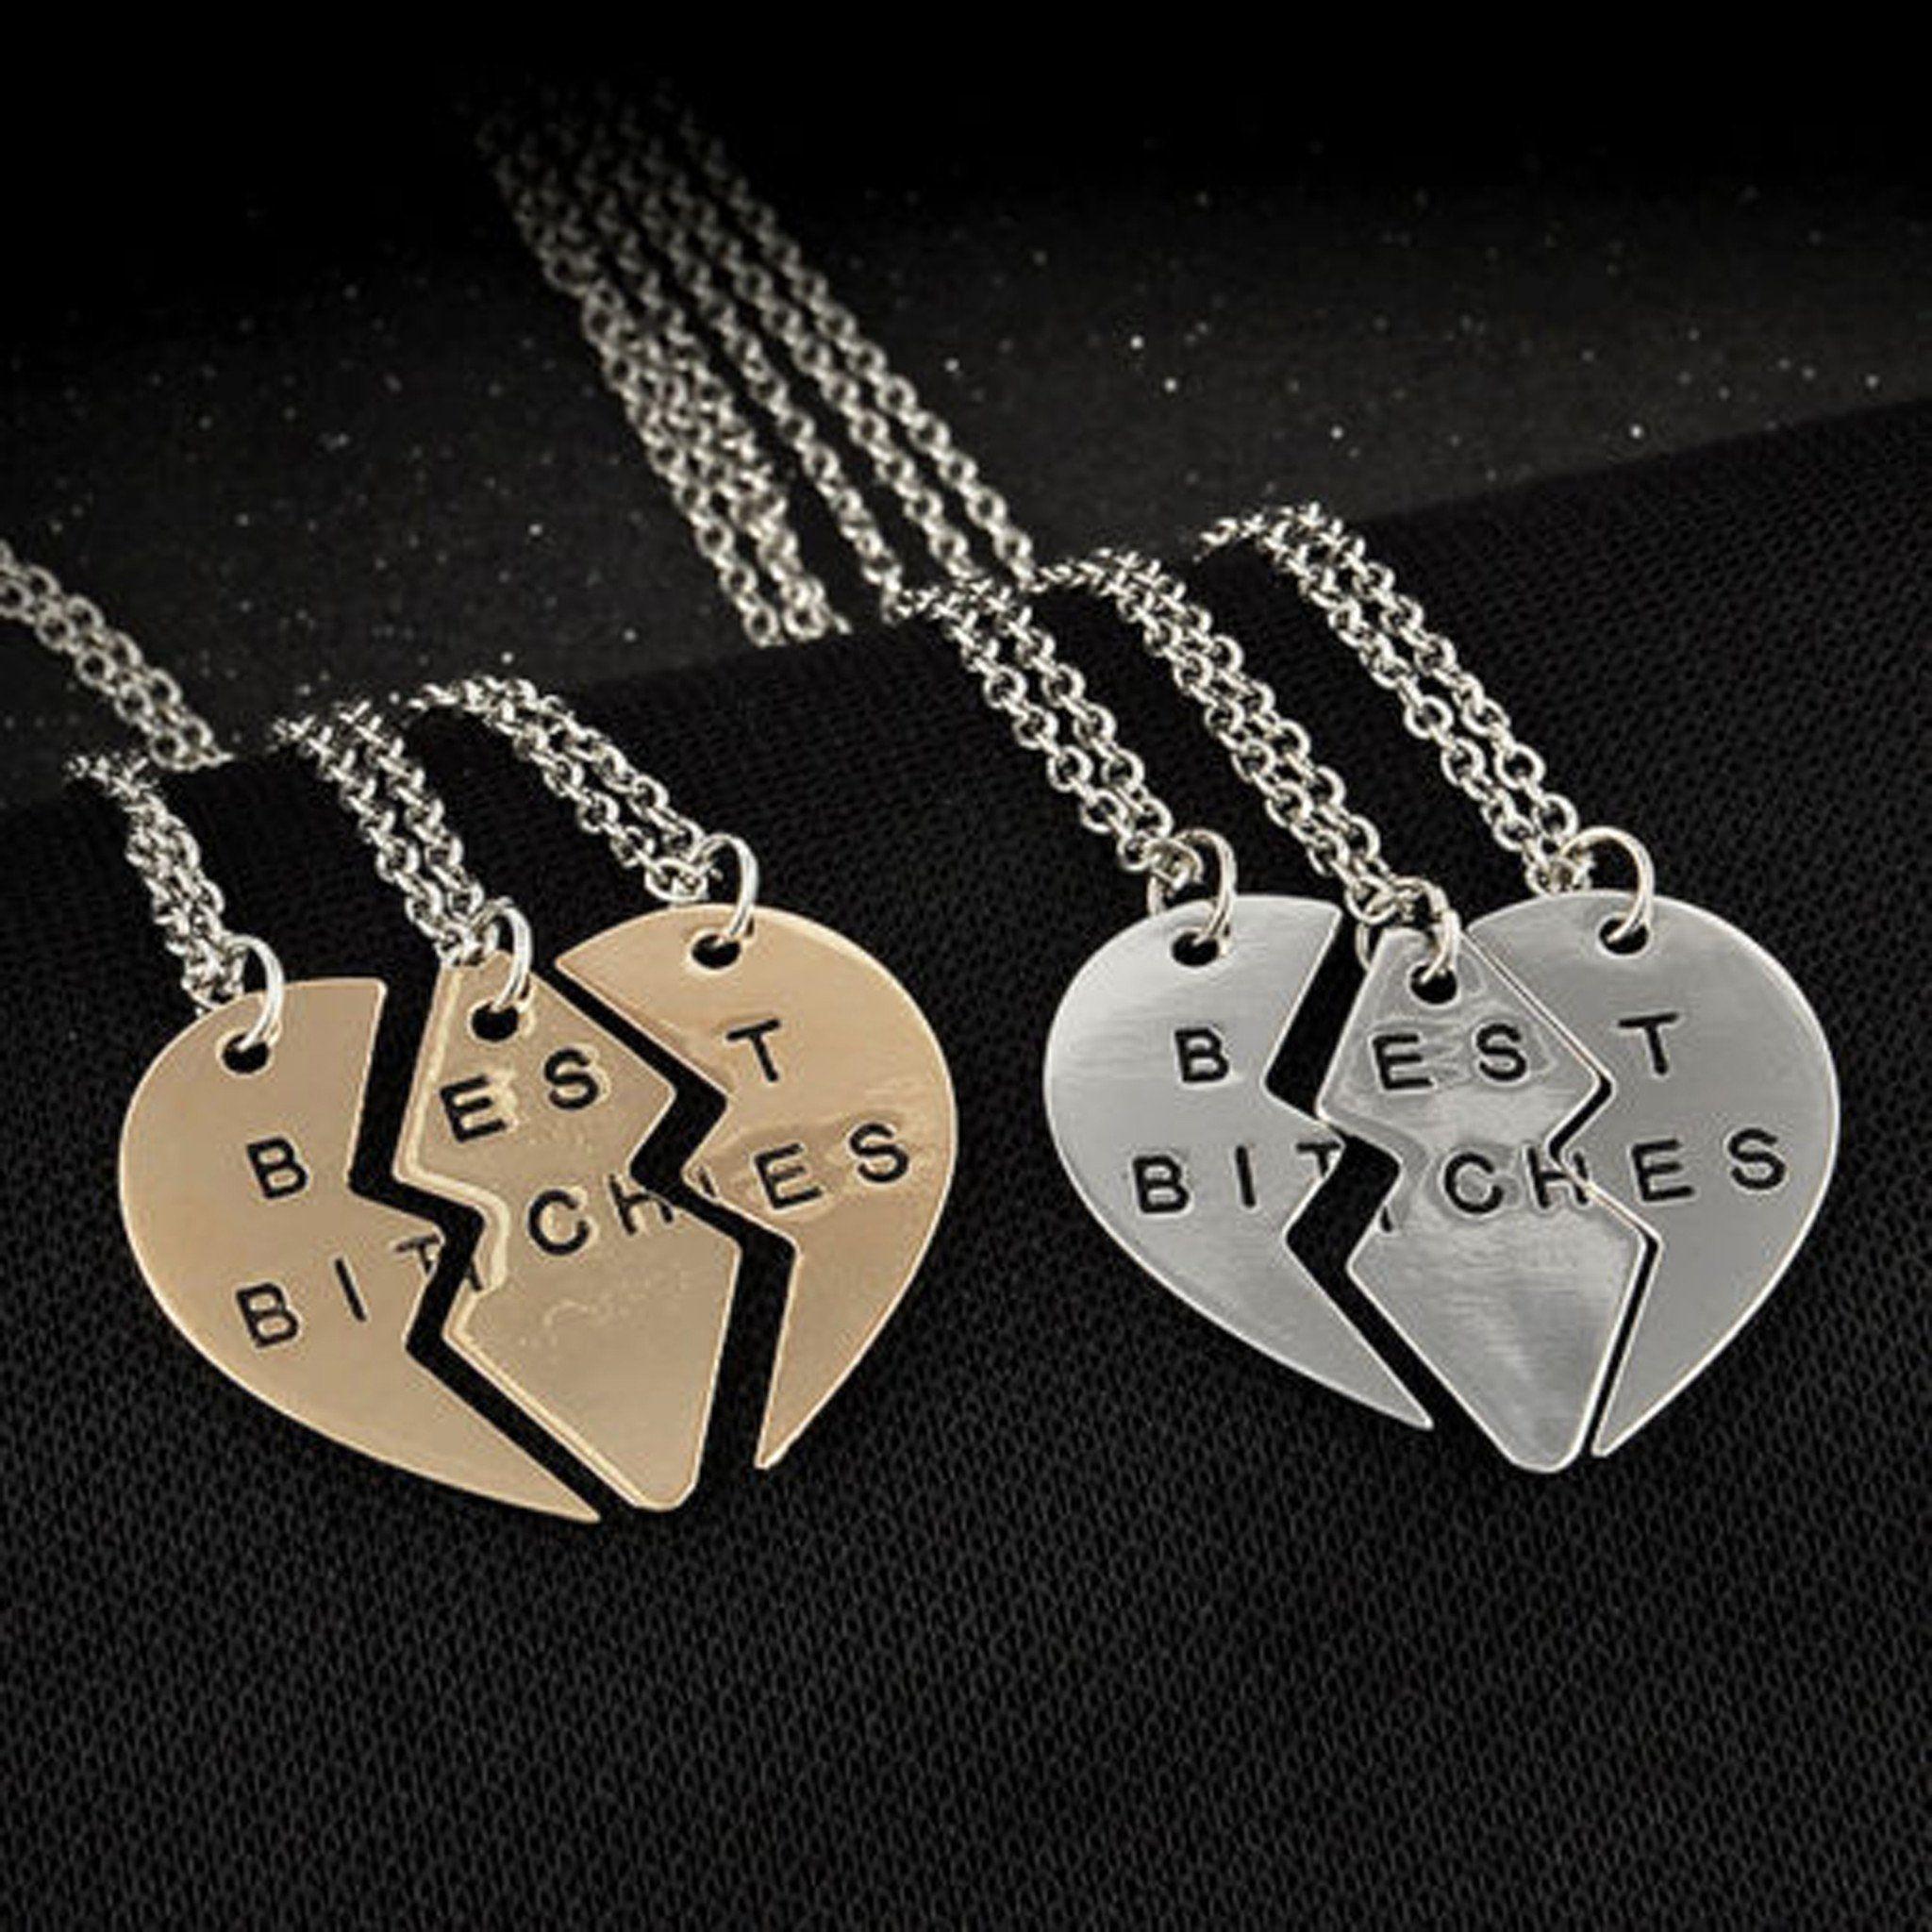 Lillian Best Friend Necklaces 3 Piece Best B S Friendship Necklace Friend Necklaces Best Friend Necklaces Friend Jewelry